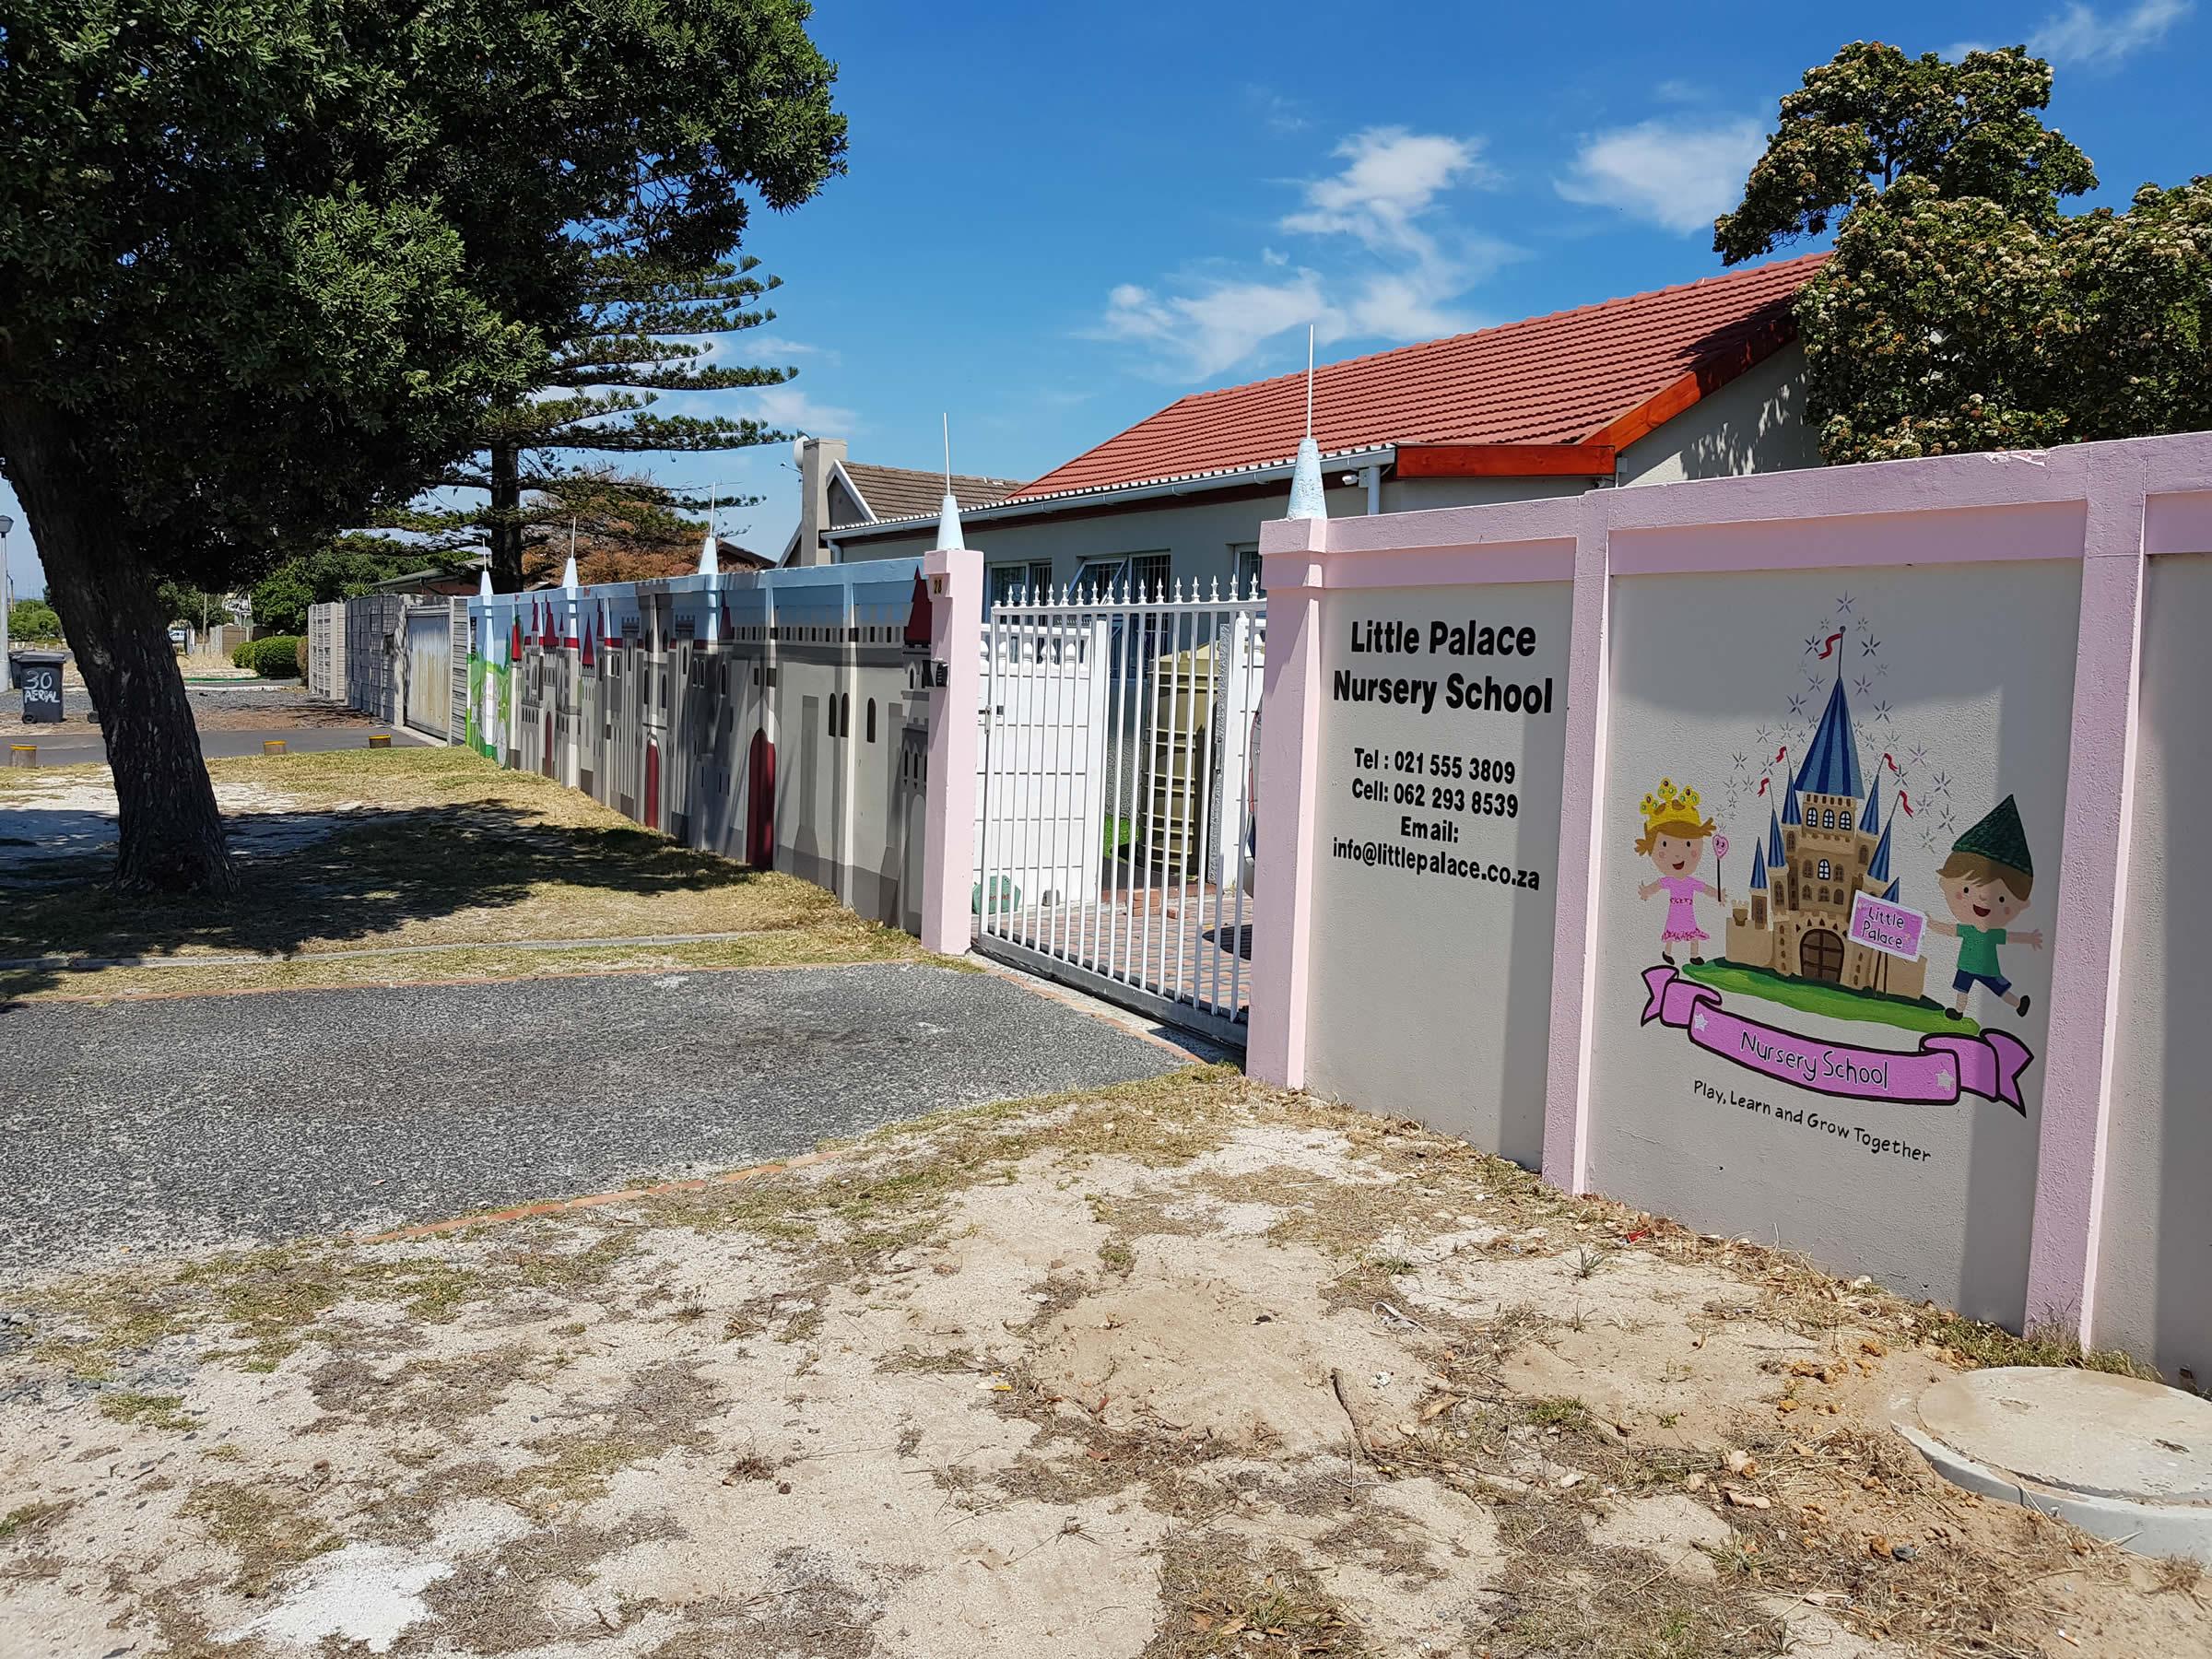 Little Palace Nursery School